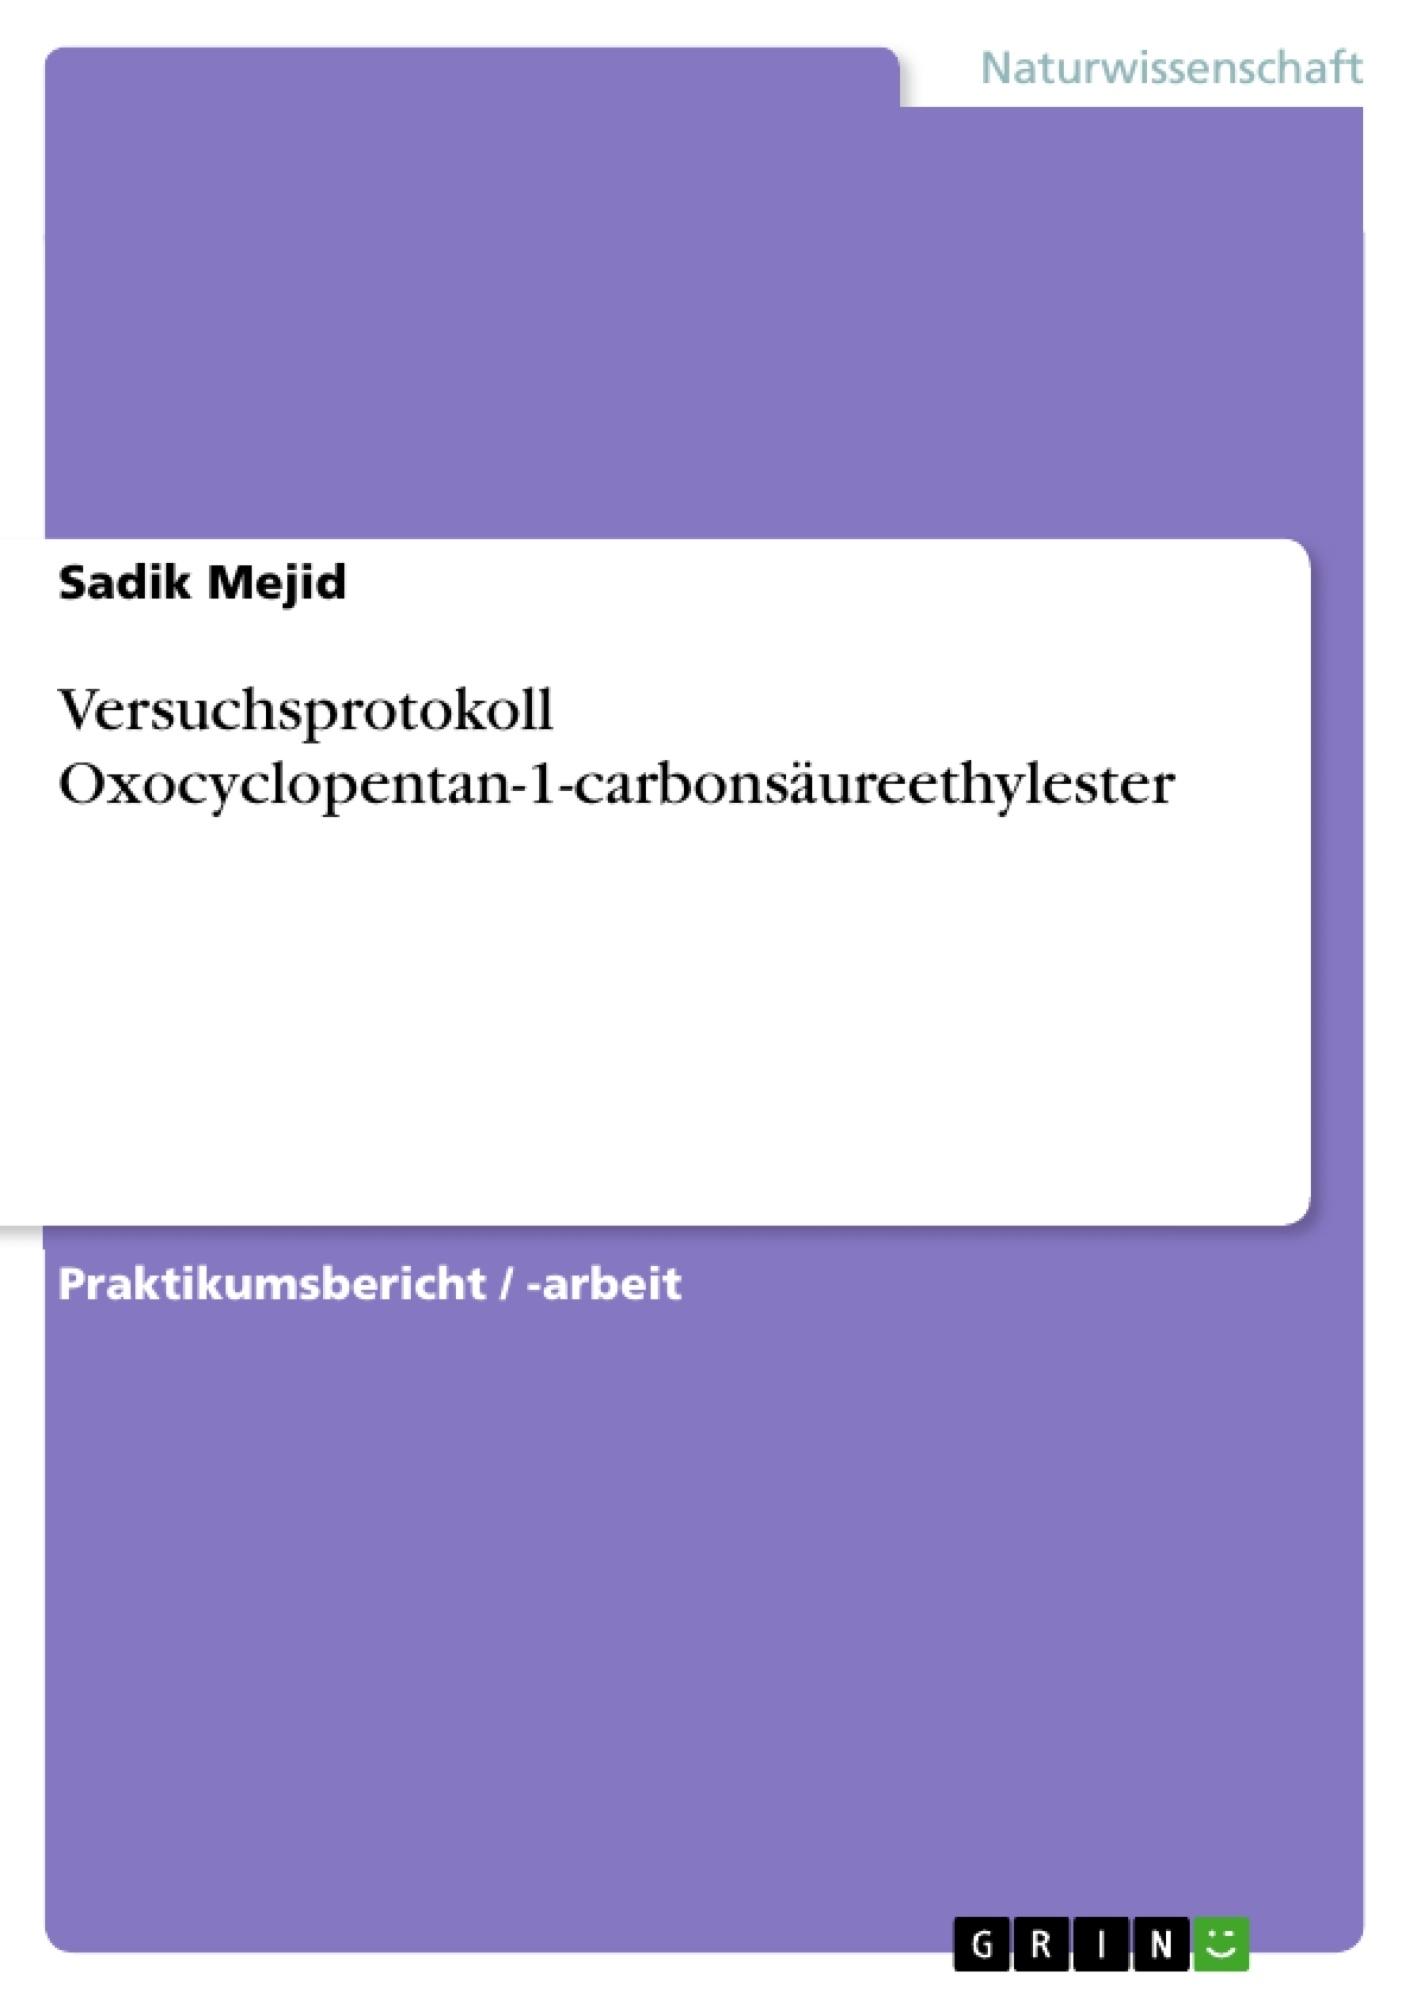 Titel: Versuchsprotokoll Oxocyclopentan-1-carbonsäureethylester